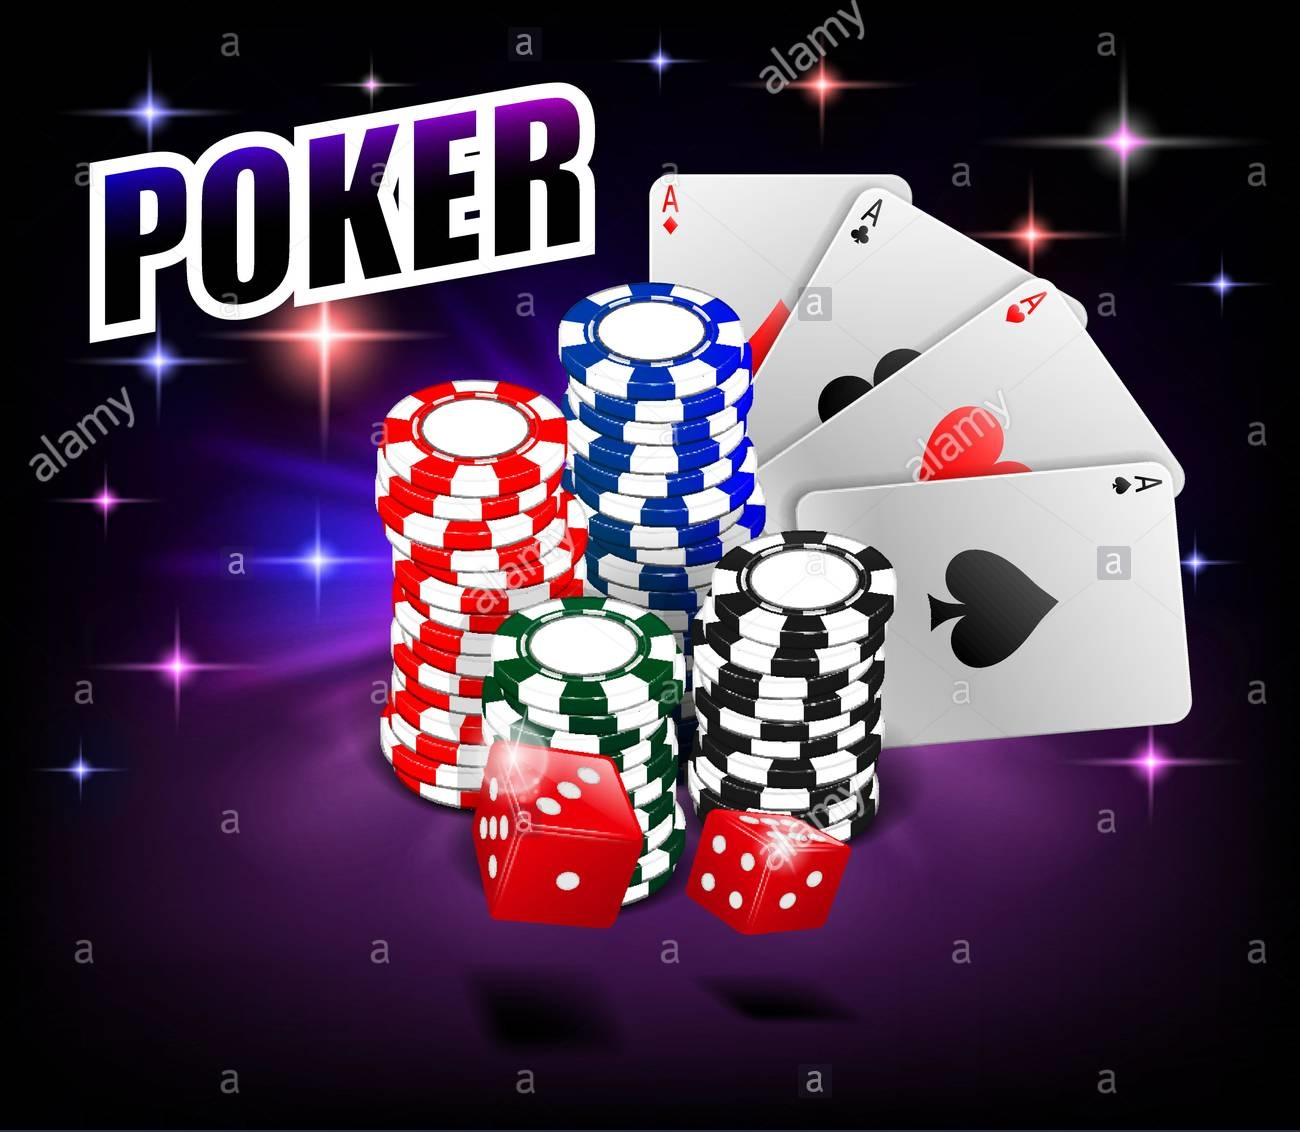 Buy 4 Get 1 free 50 CASINO,  GAMBLING,  POKER related high quality pbn backlinks